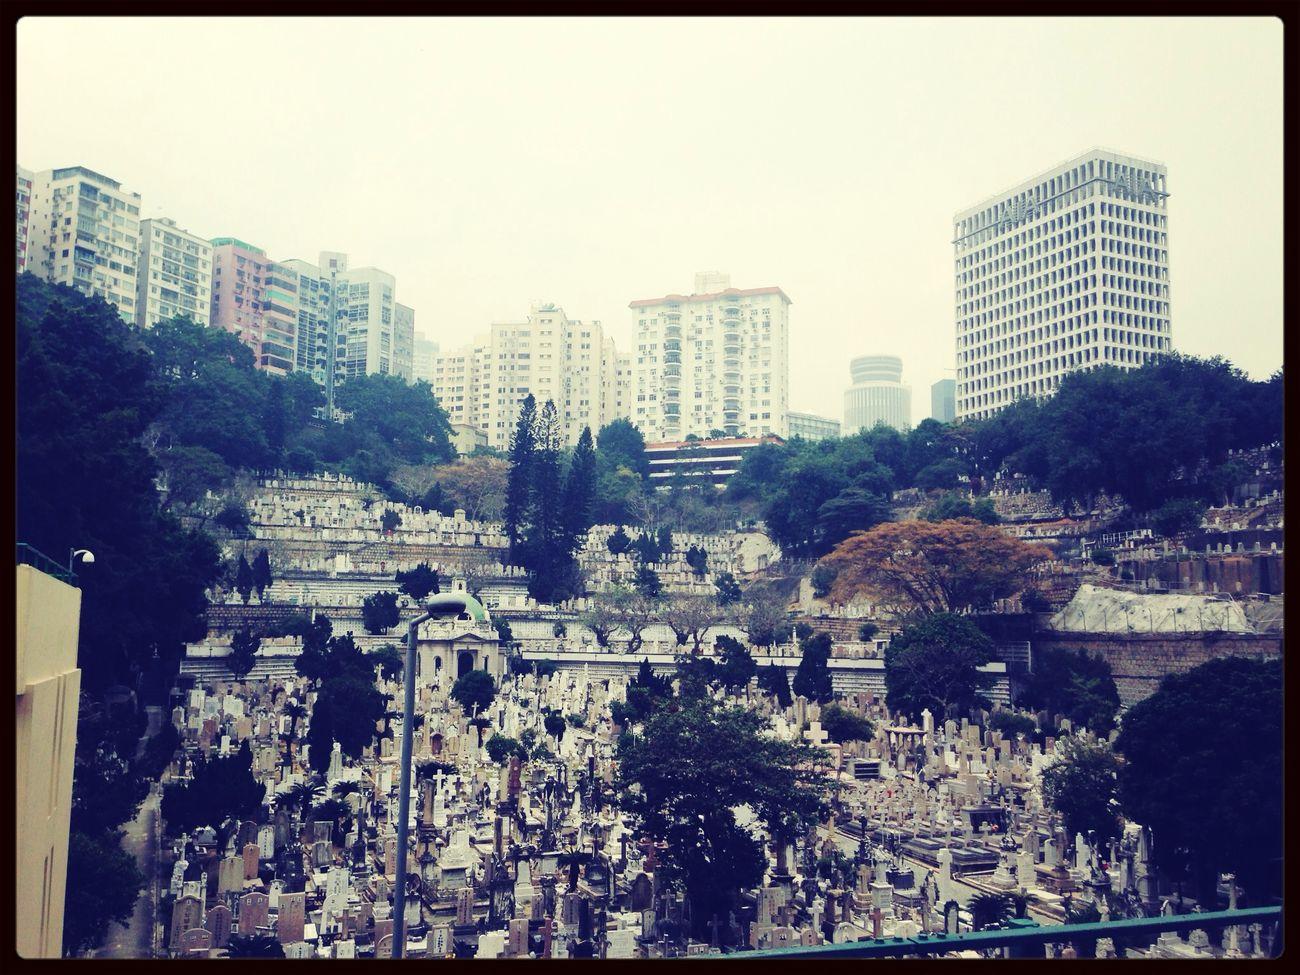 Underneath the big buildings and crowded people, beneath lies the place where dead people are sleeping. Rest in peace their soul. Eyeemhk Eyeemsnapshot Rip Eyeemmood